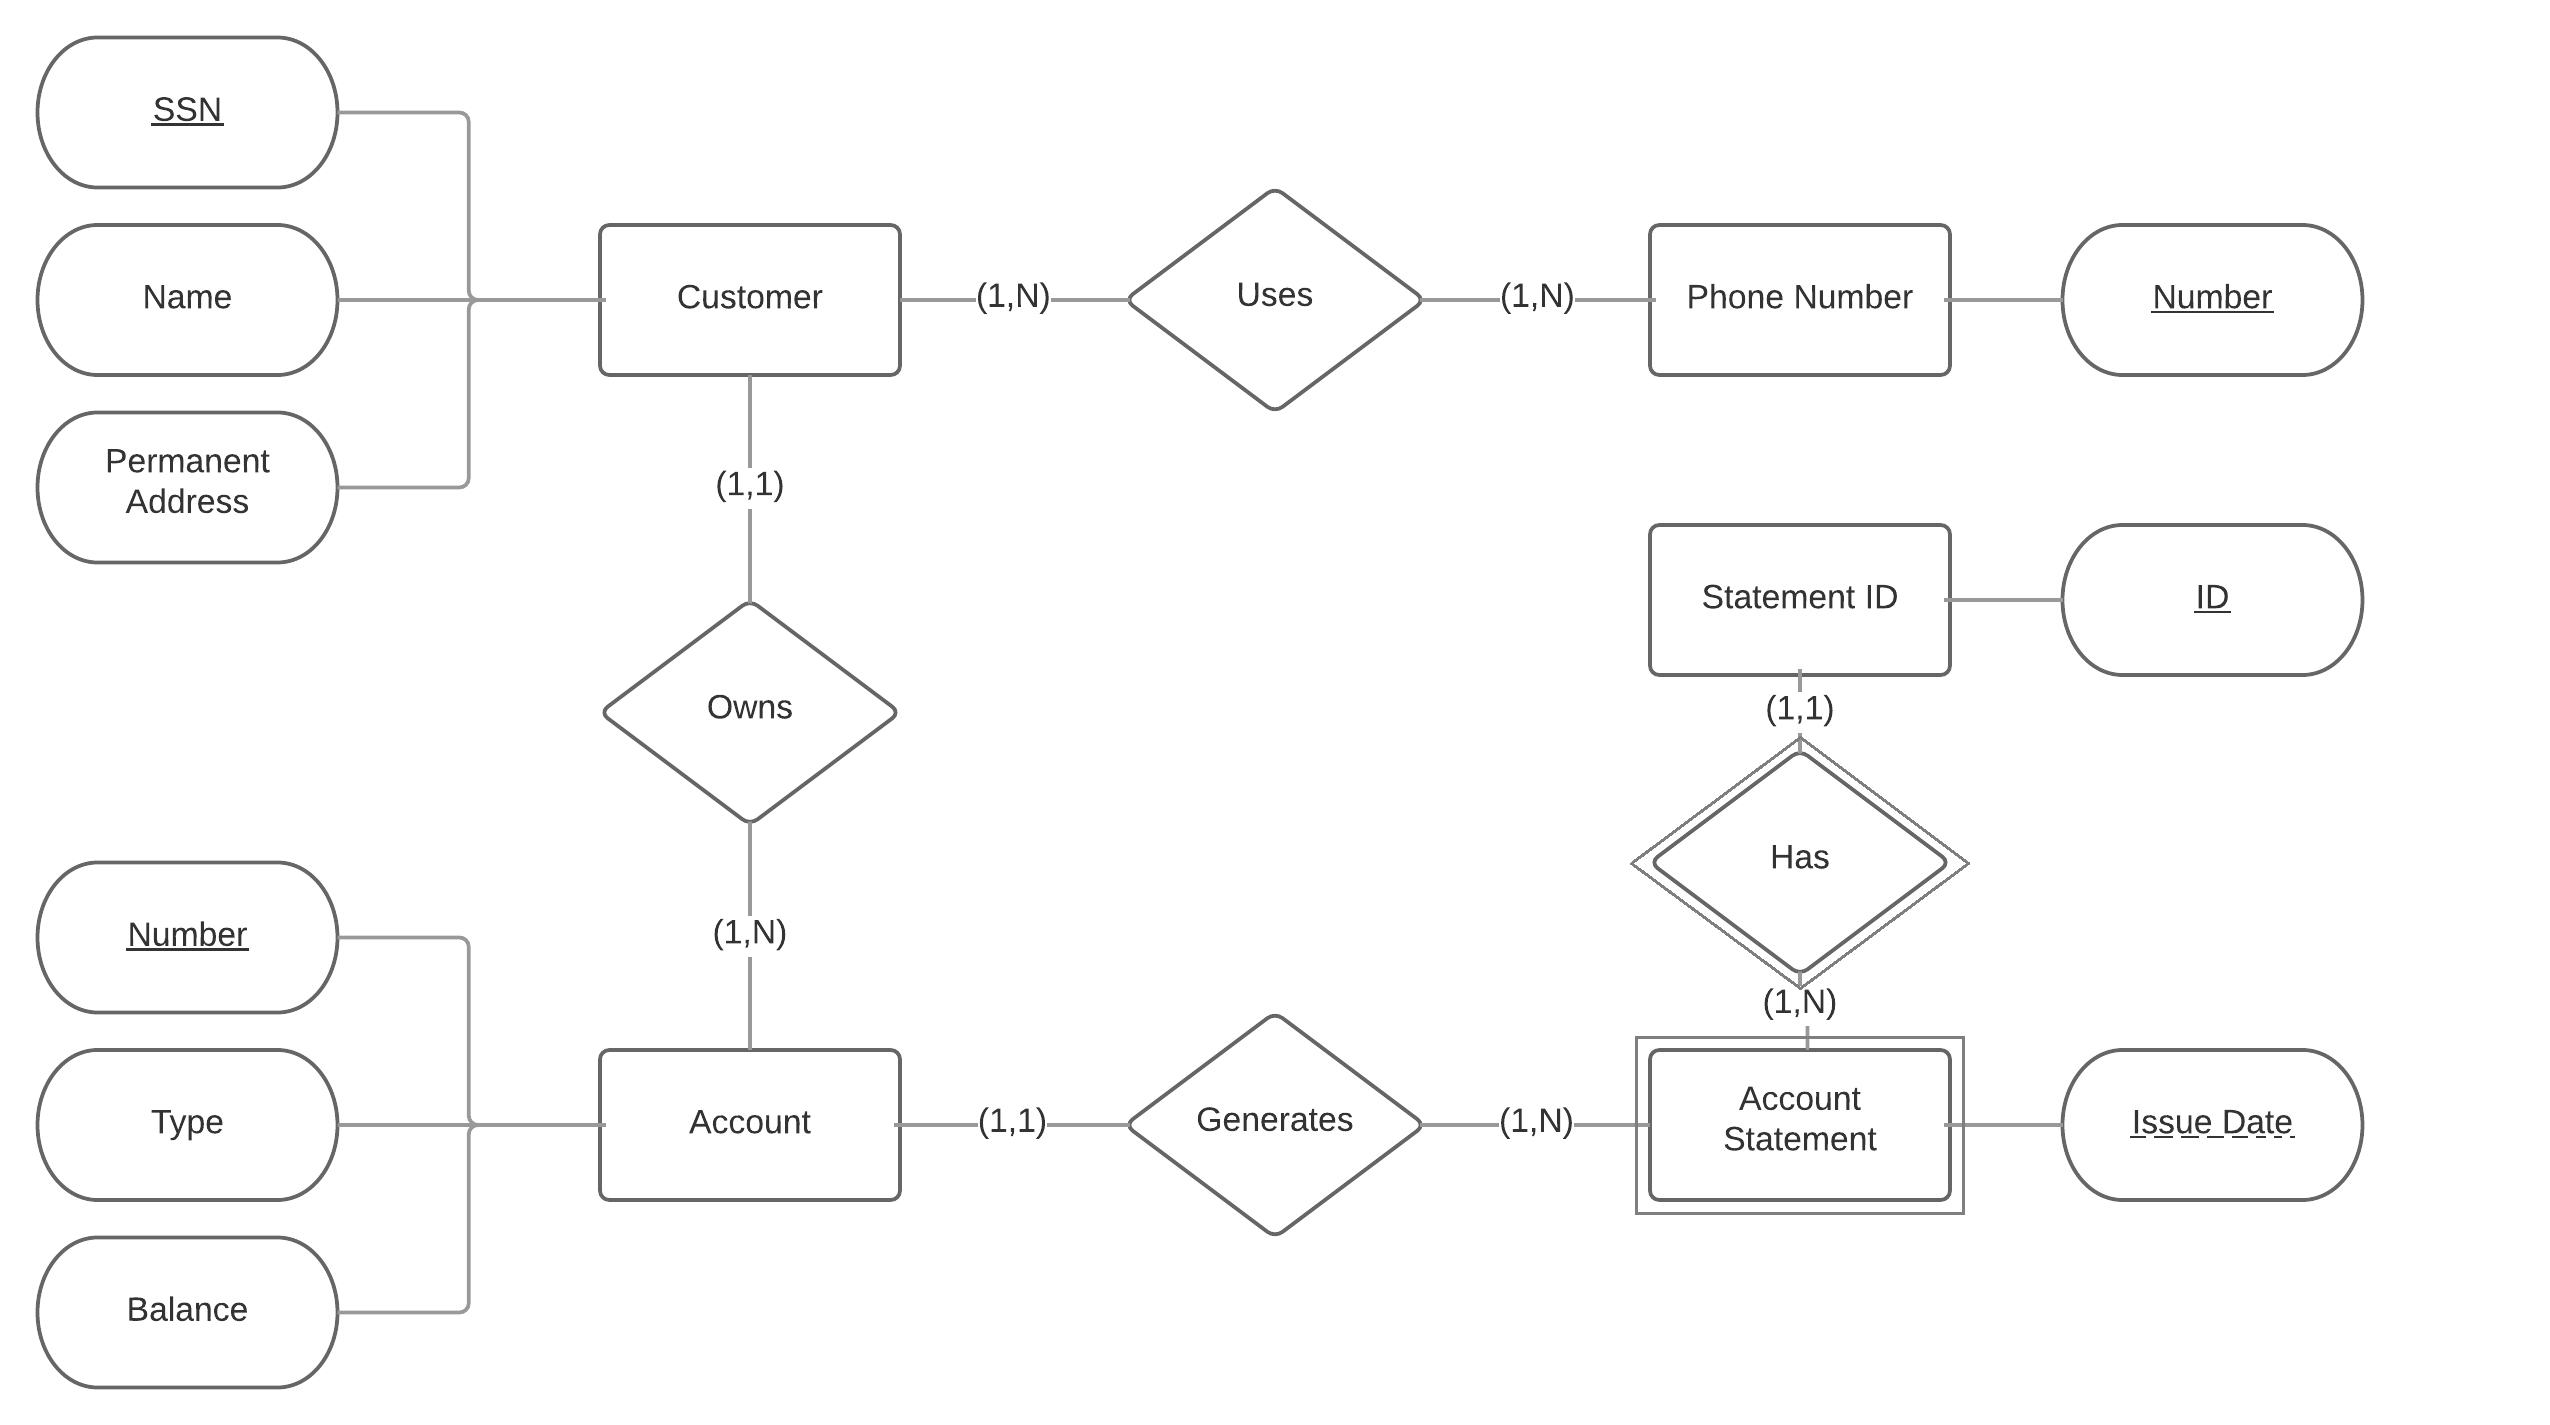 Relational Database - Is This Er Diagram Correct? - Stack intended for 1 To 1 Relationship Er Diagram